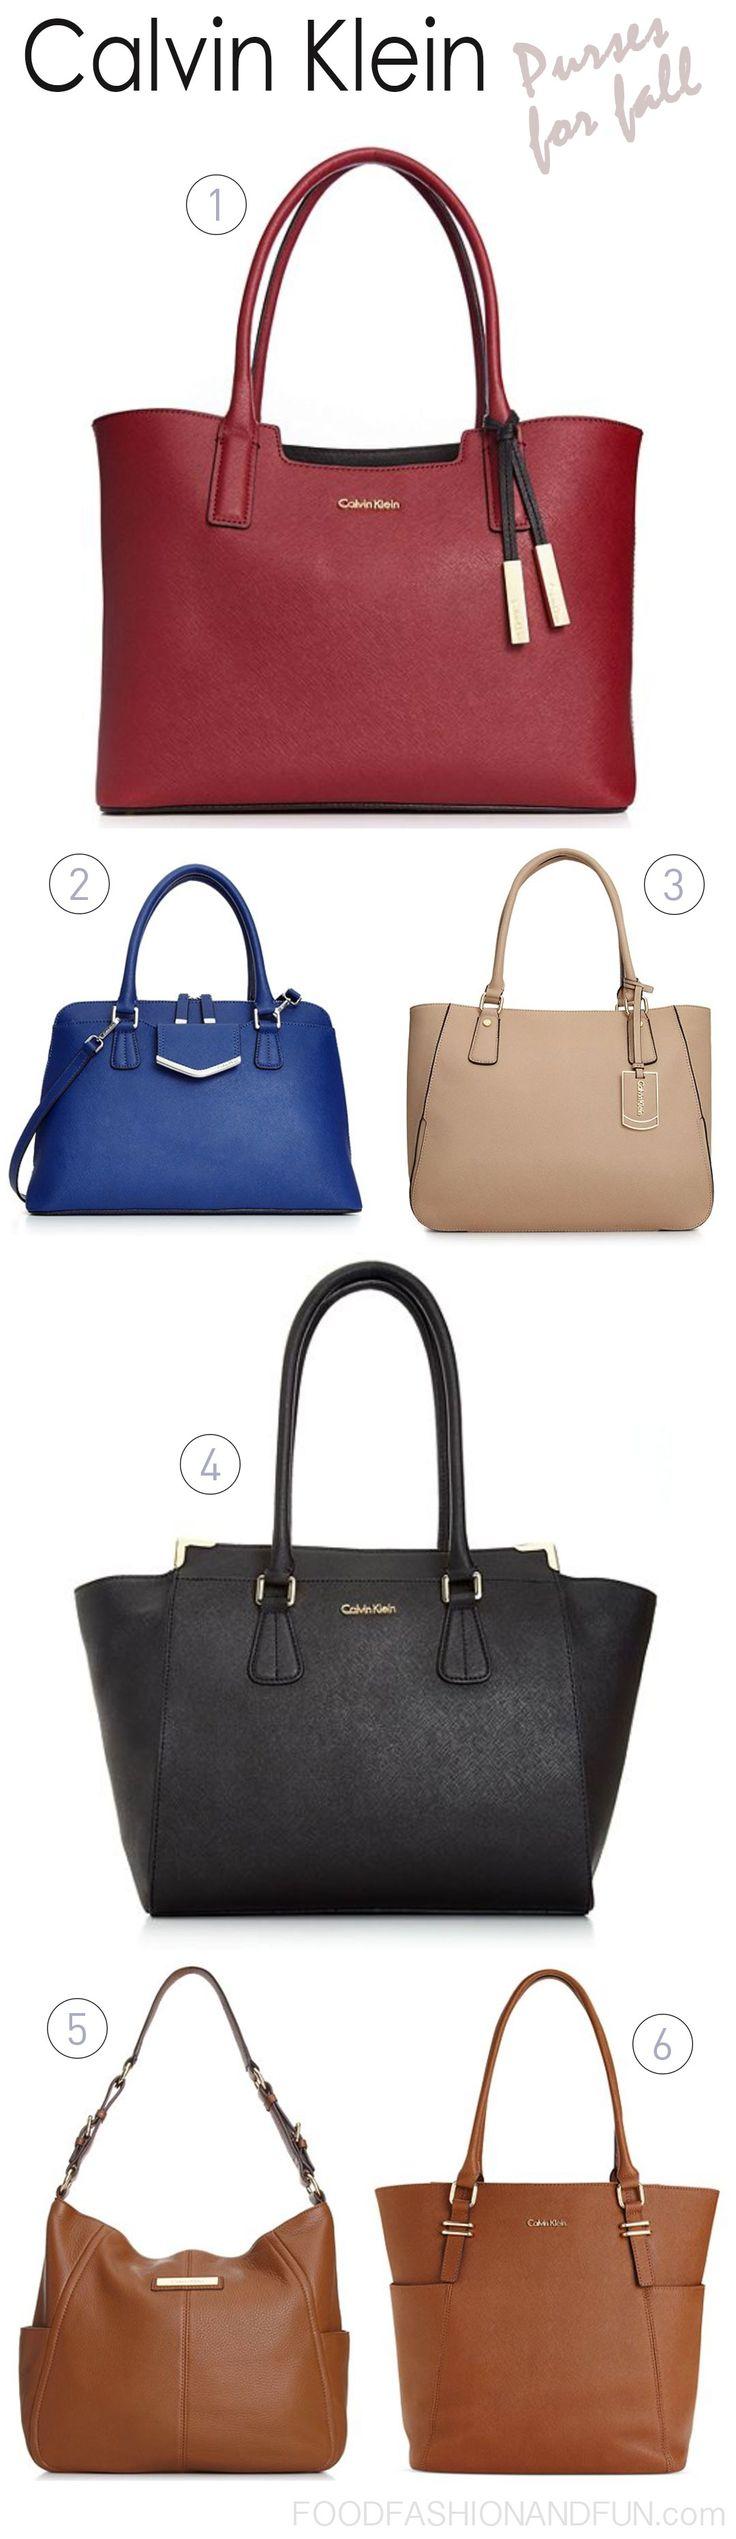 Calvin Klein purses for #fall